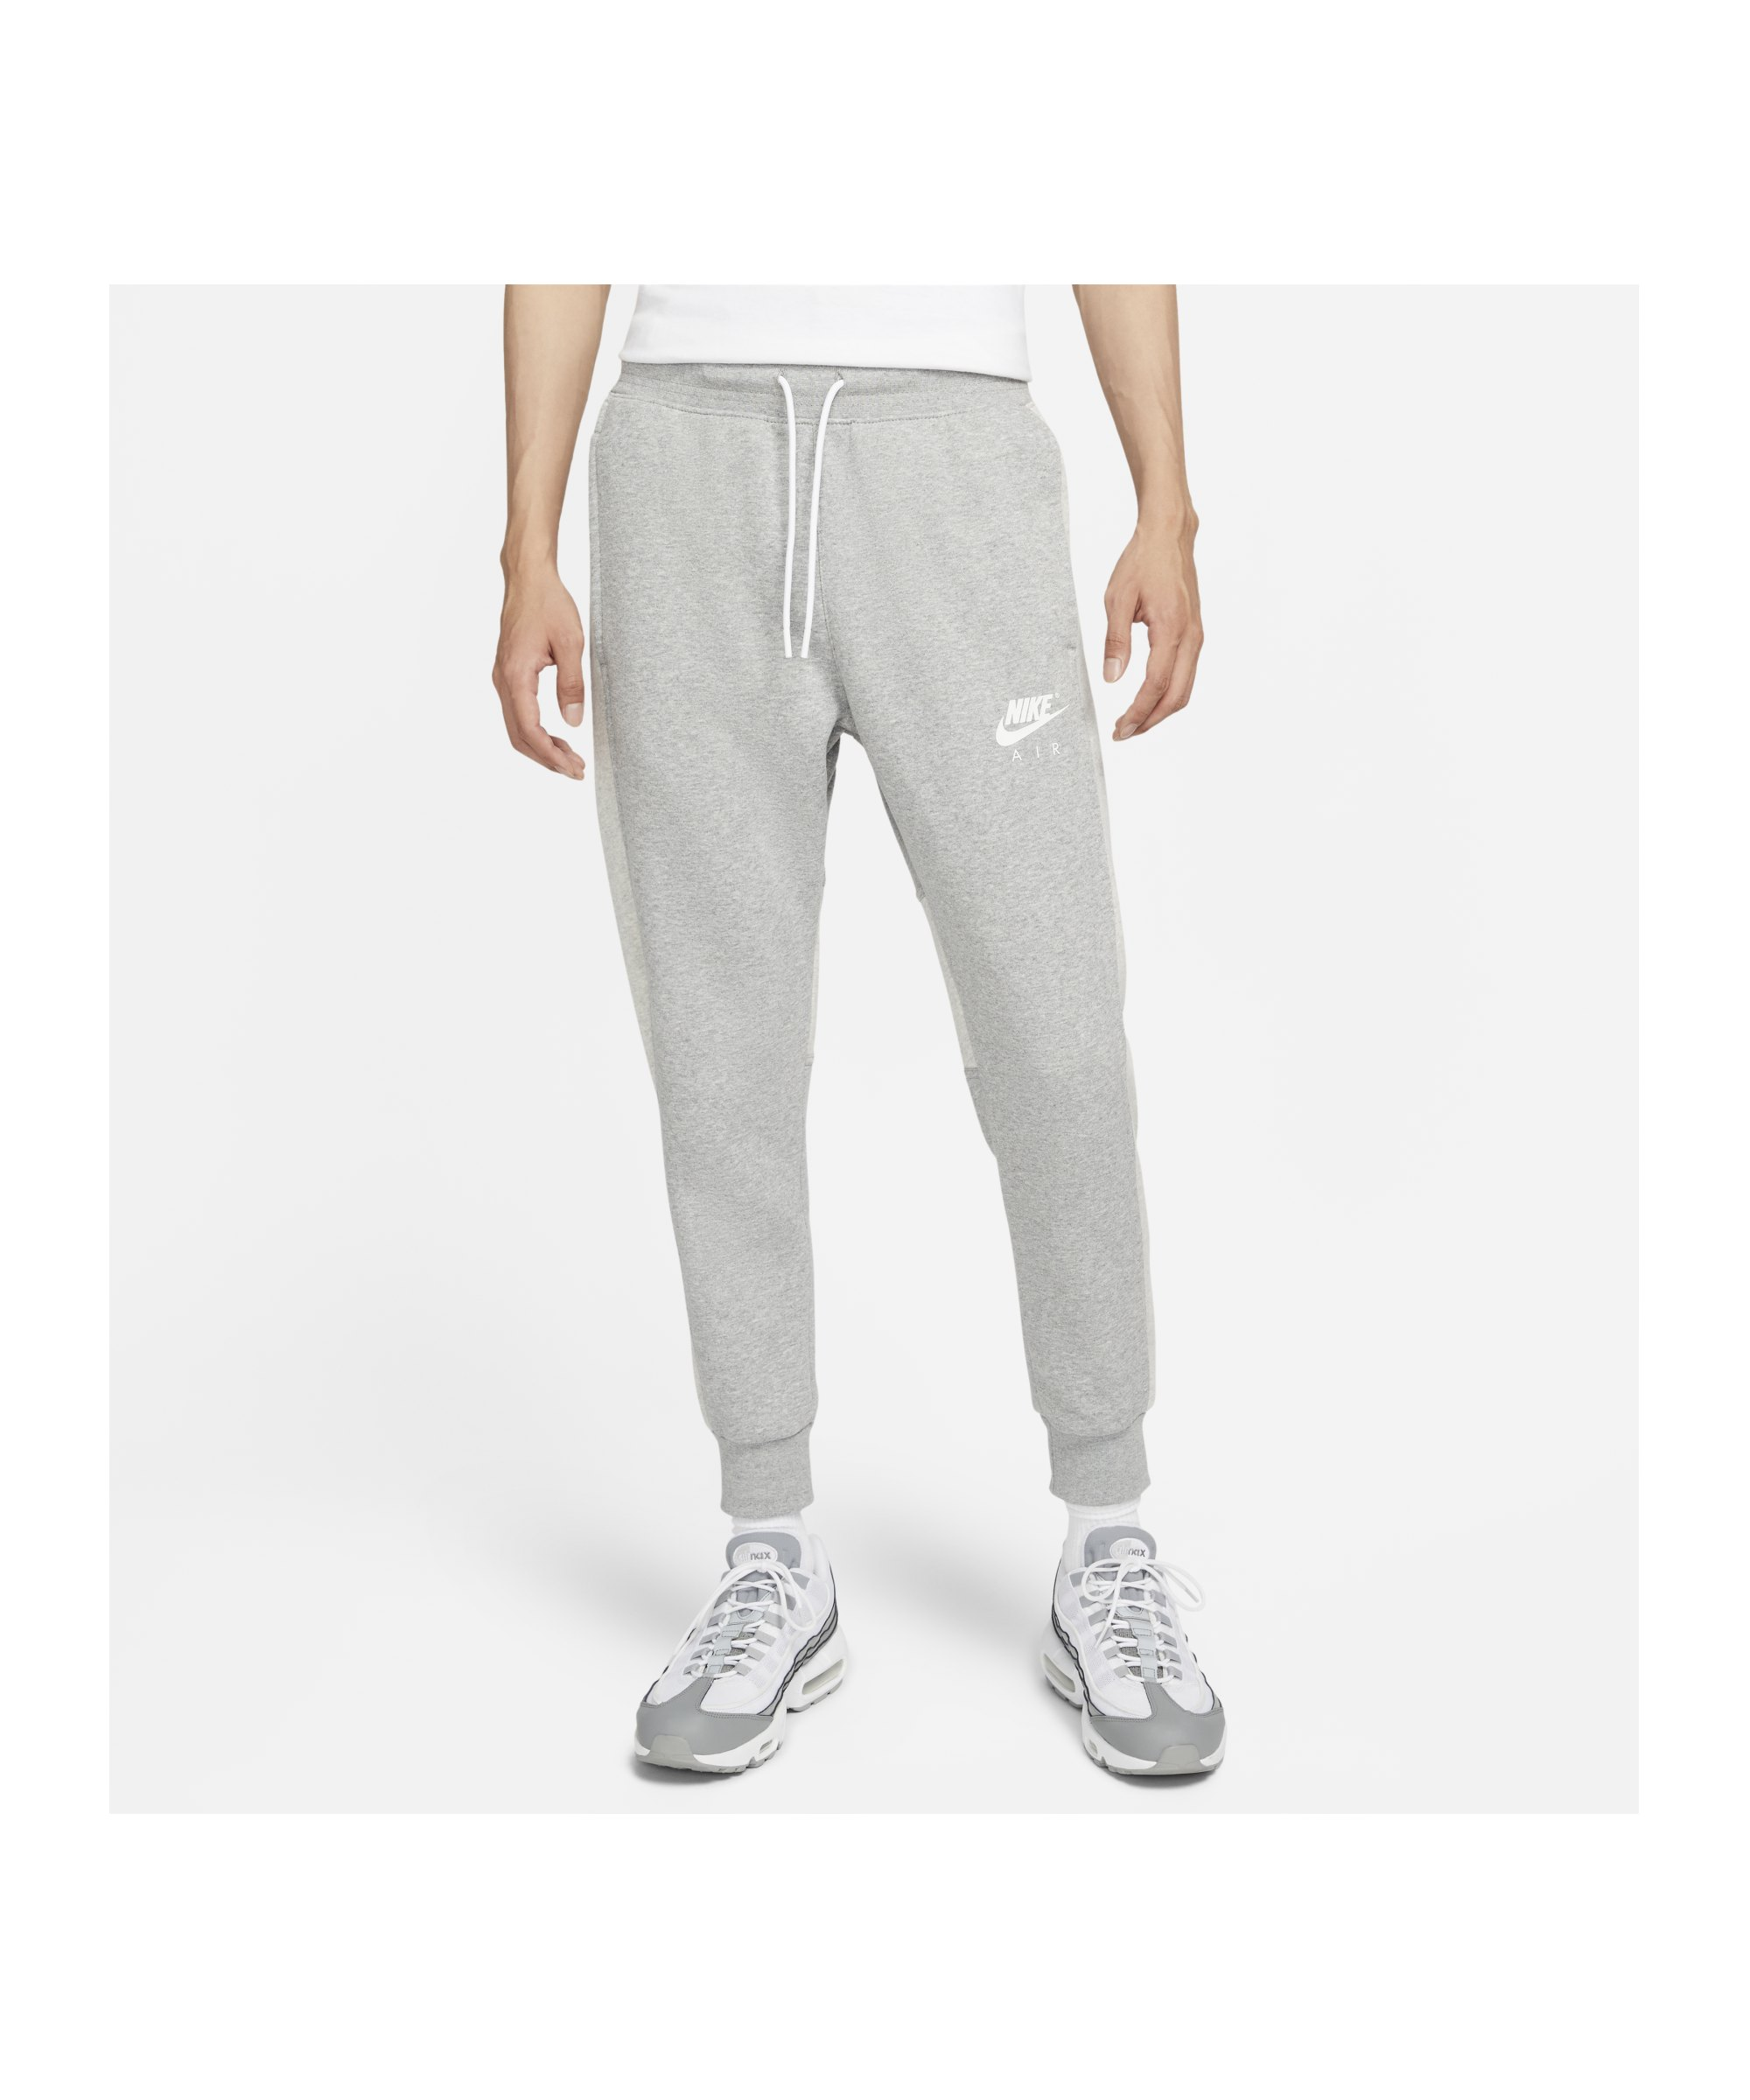 Nike Air Brushed-Back Fleece Jogginghose Grau F063 - grau